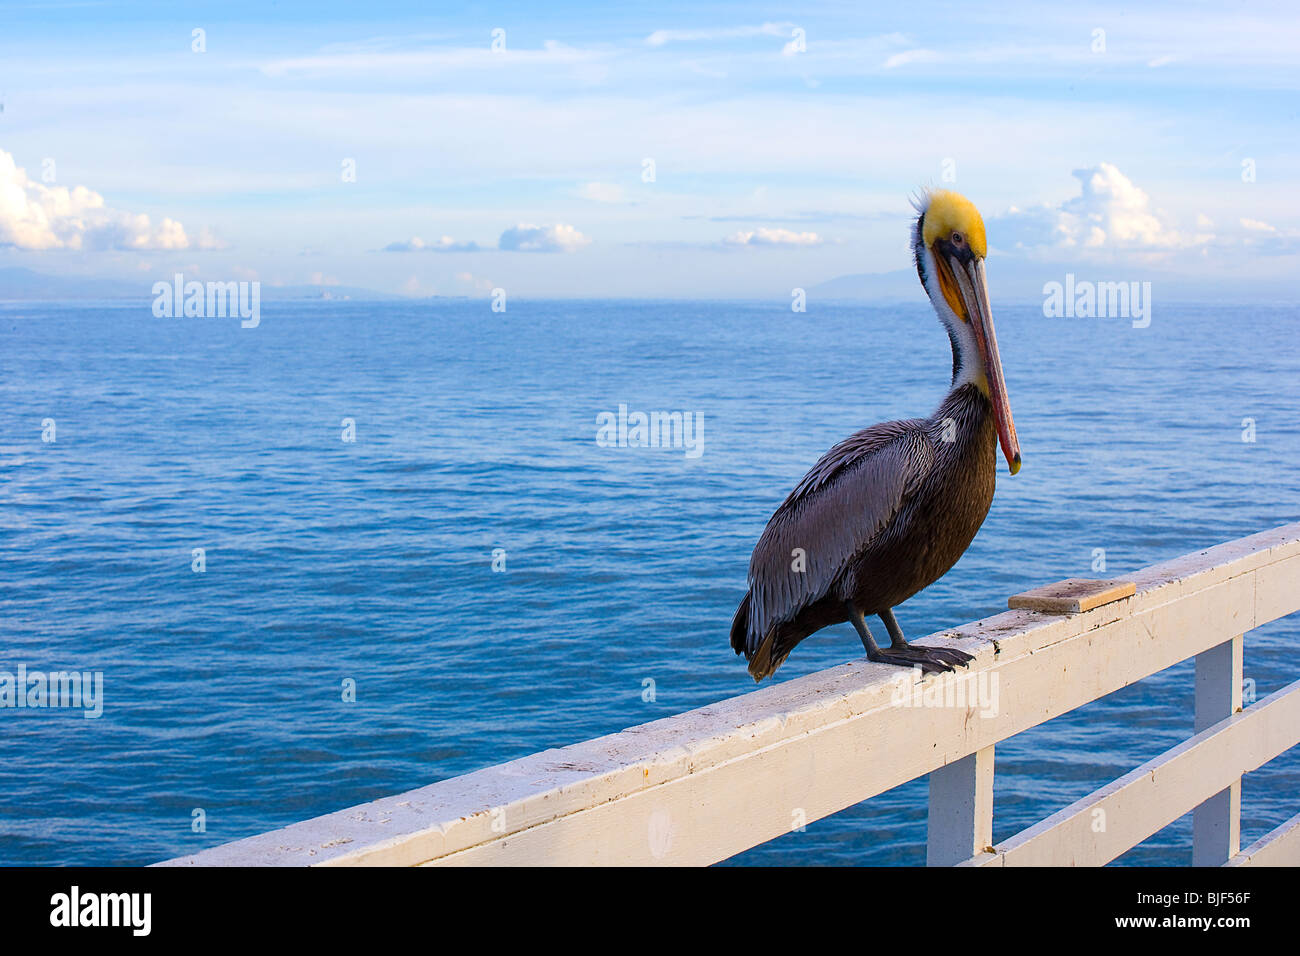 Ein Pelikan auf dem Pier in Santa Cruz, Kalifornien Stockbild